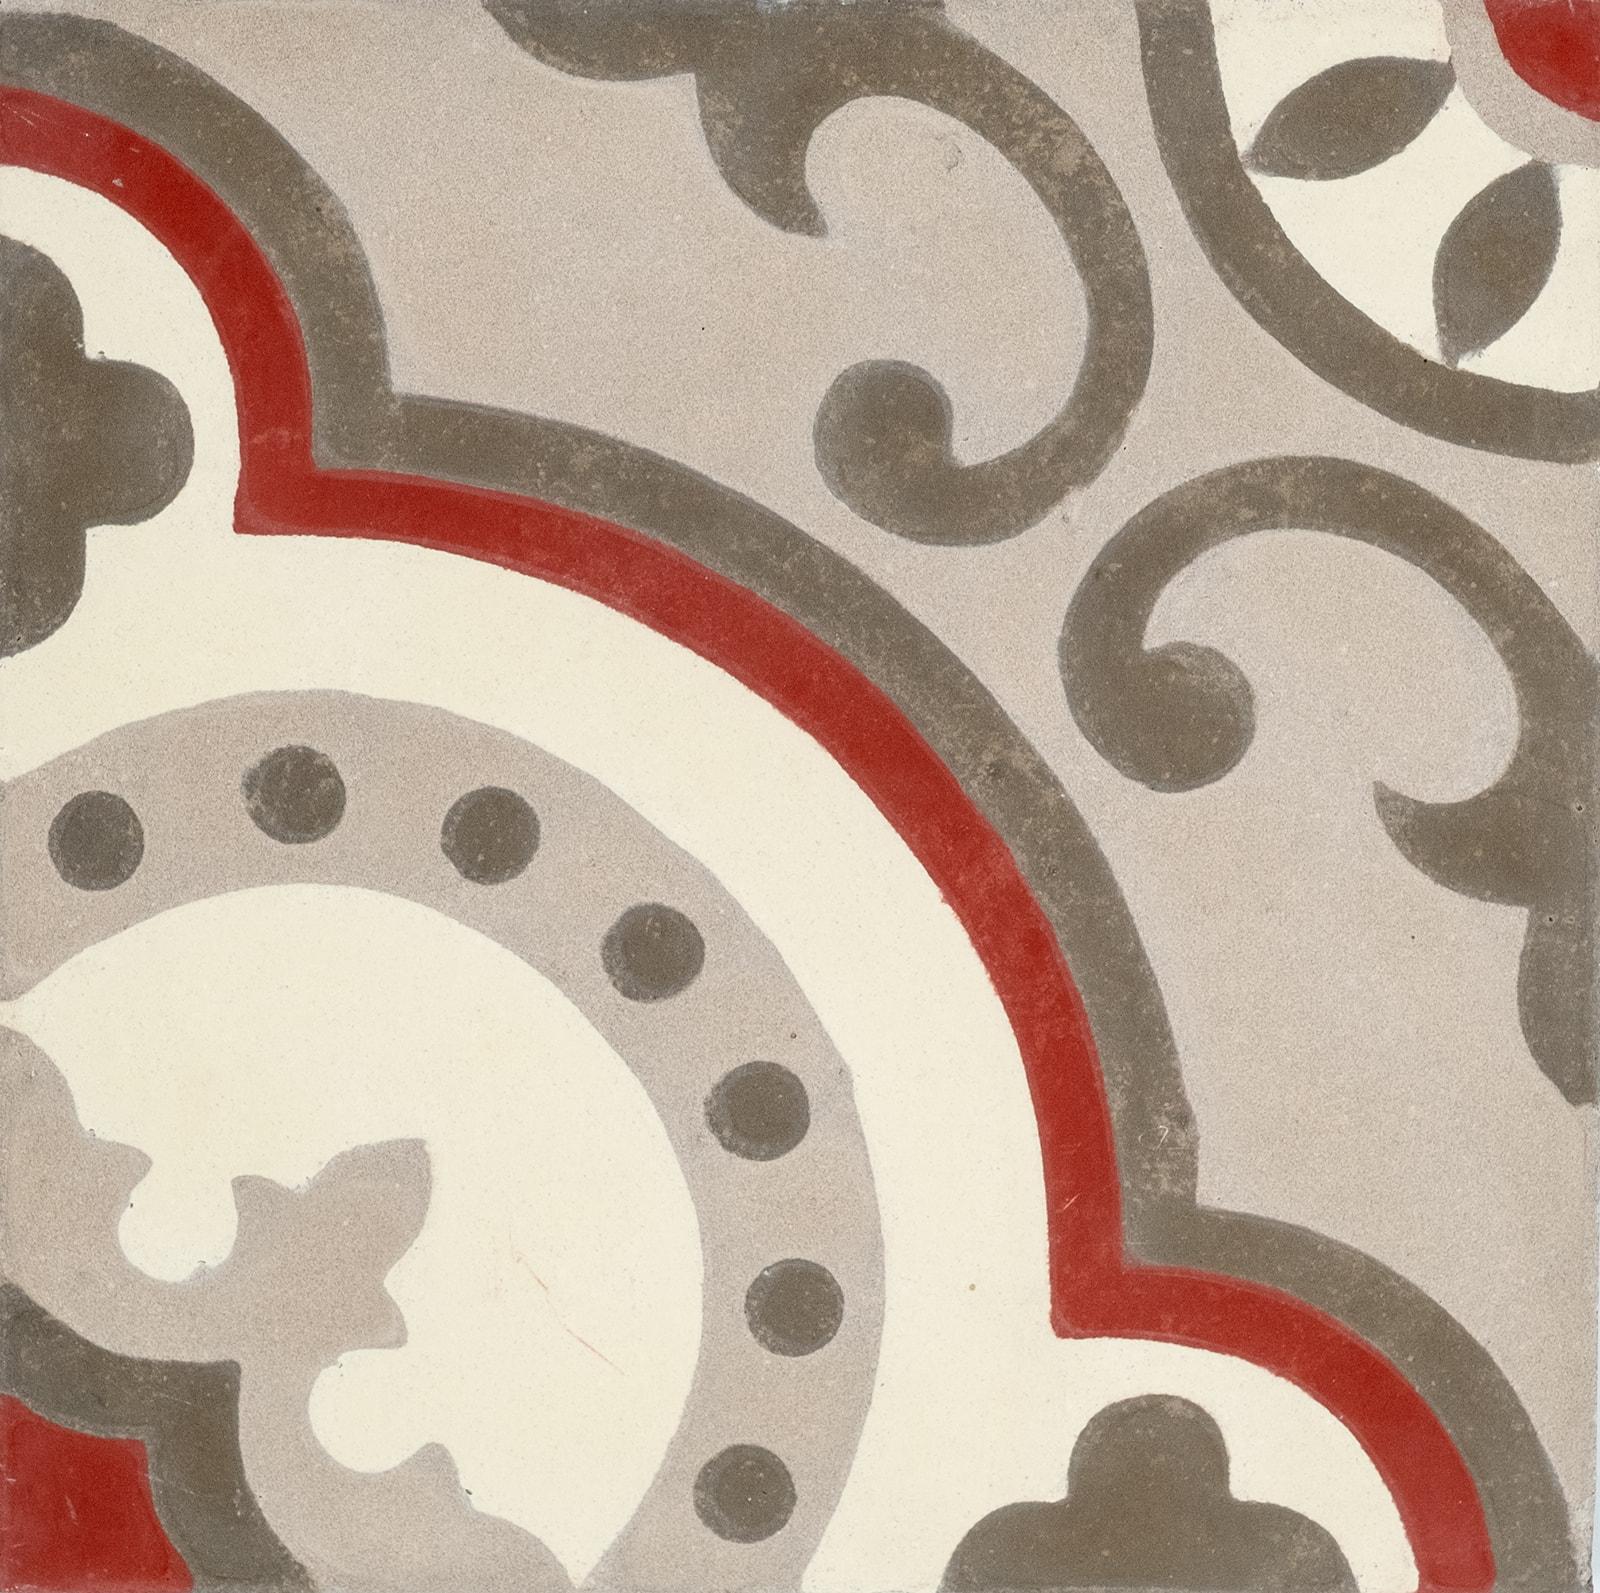 carreau de ciment floral arborescence sud ouest. Black Bedroom Furniture Sets. Home Design Ideas